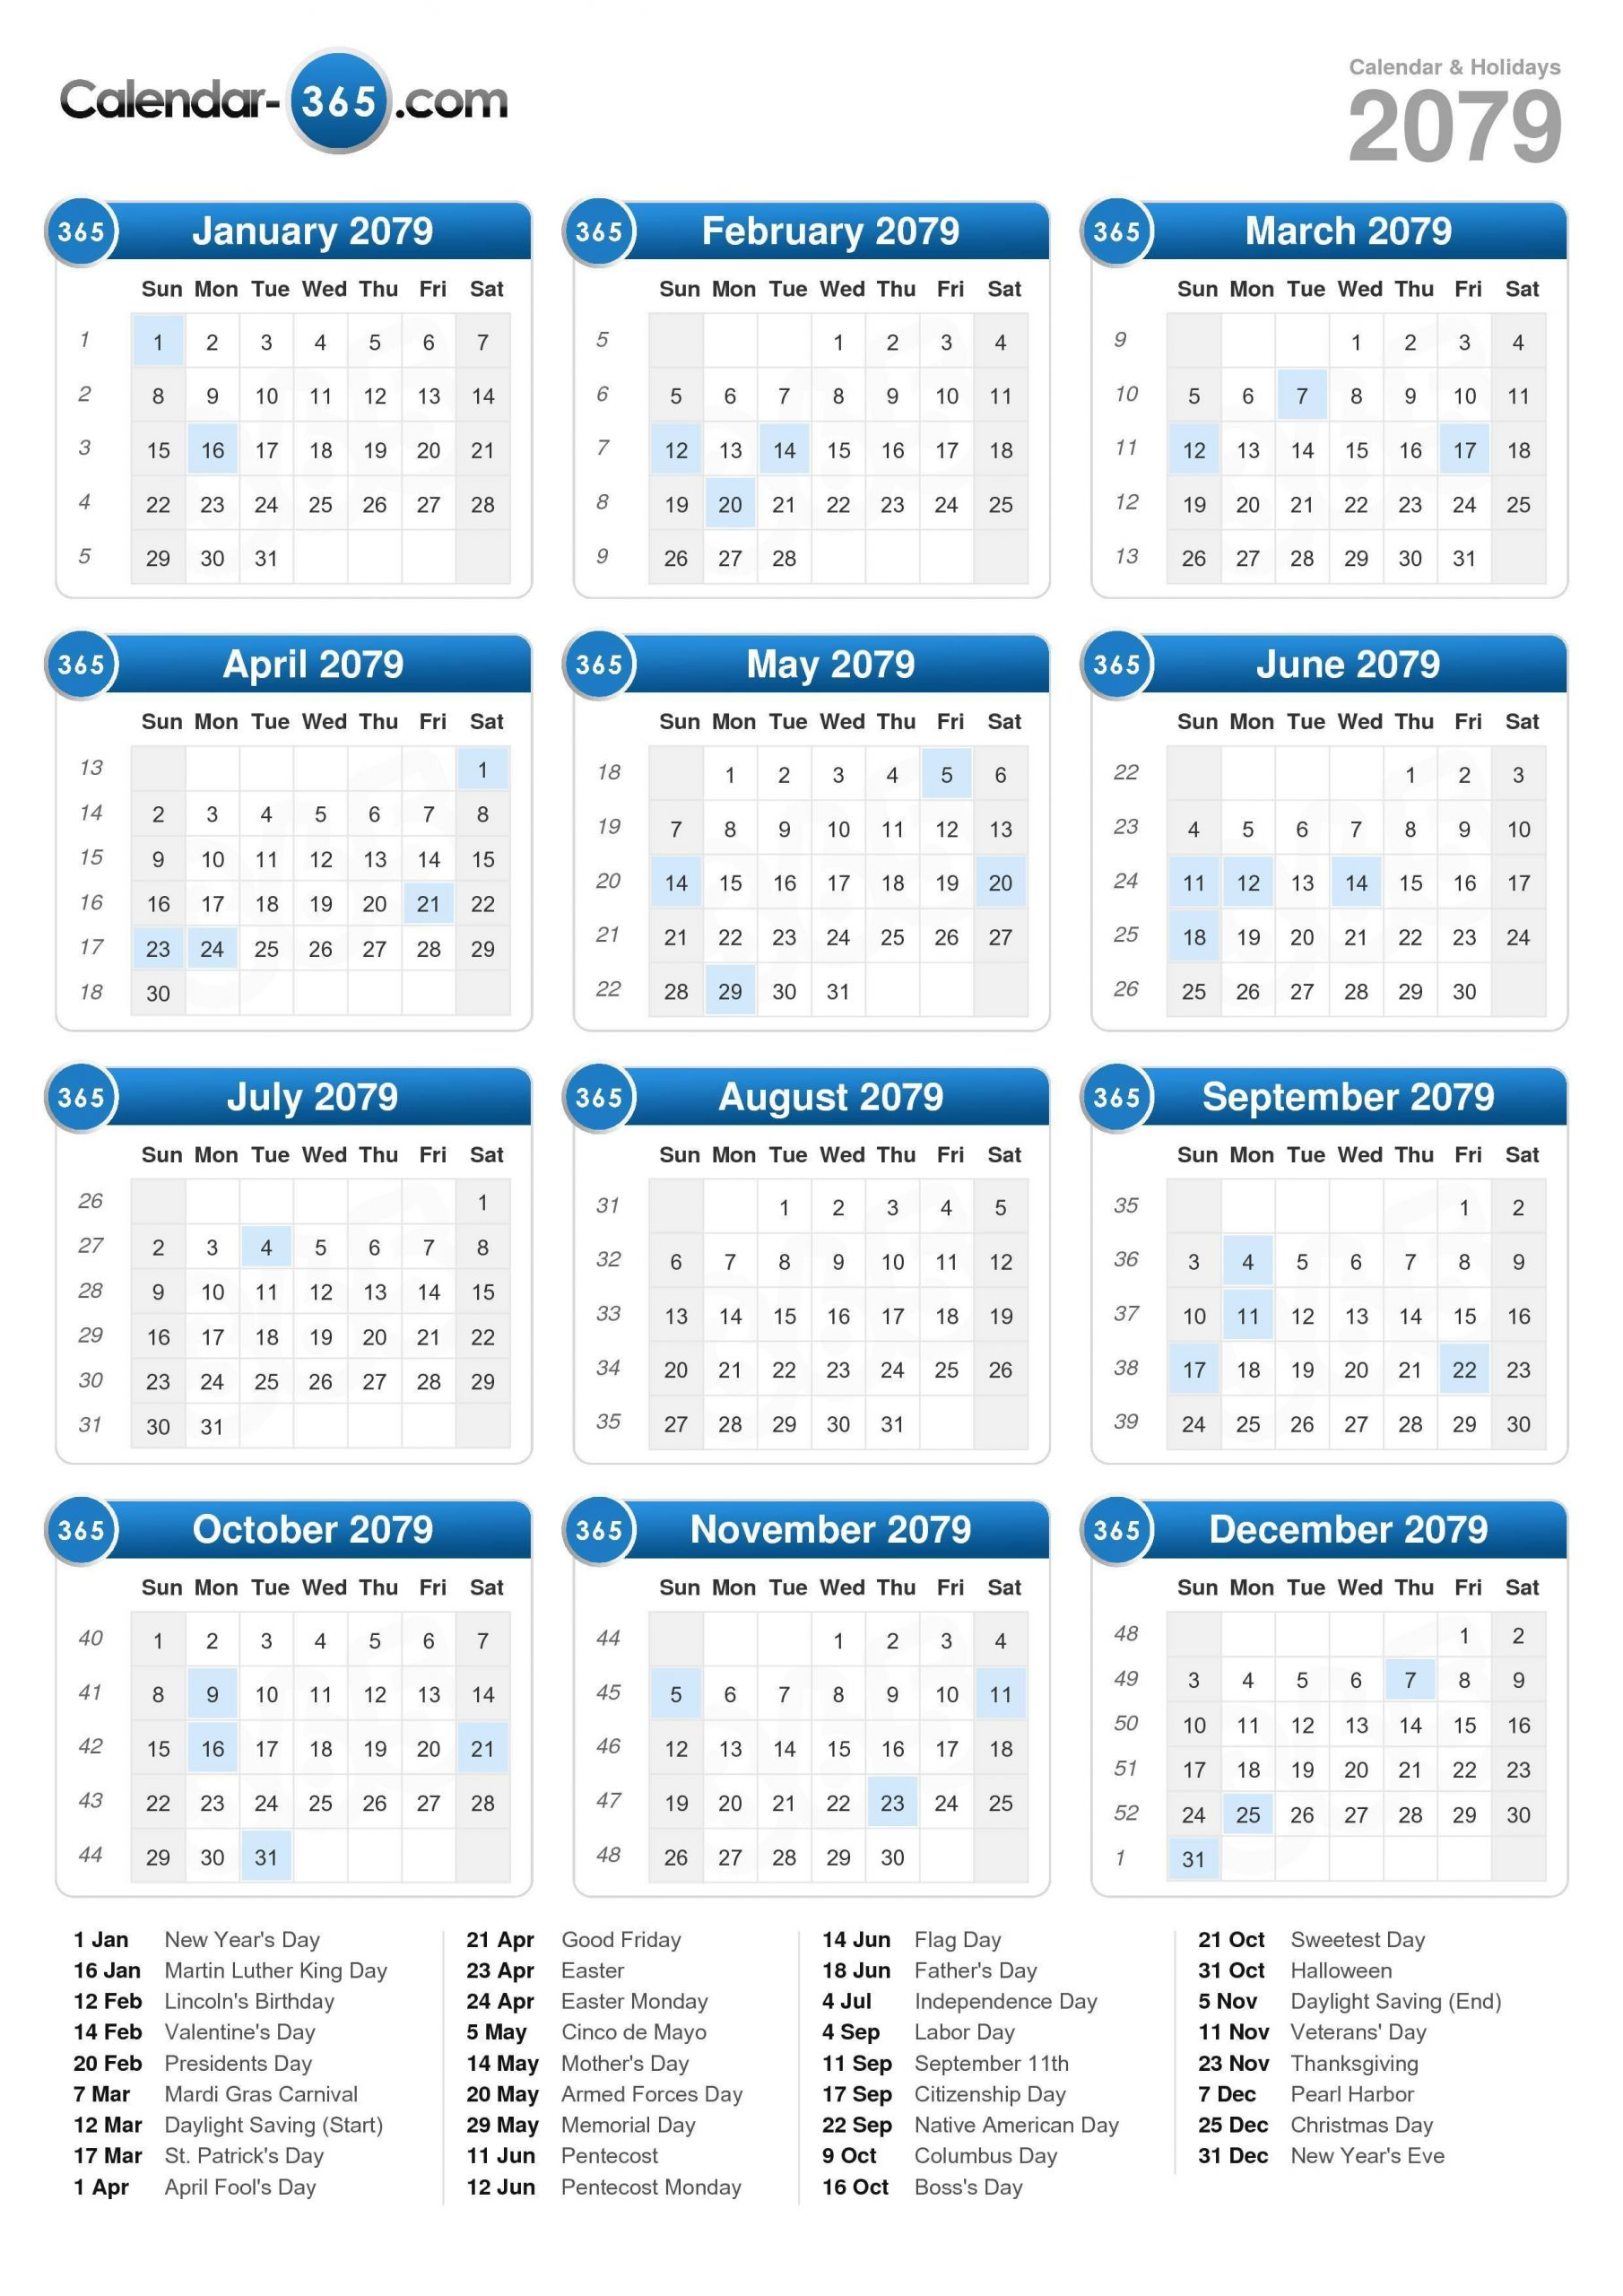 2079 Calendar Calendar With 365 Days Numbered